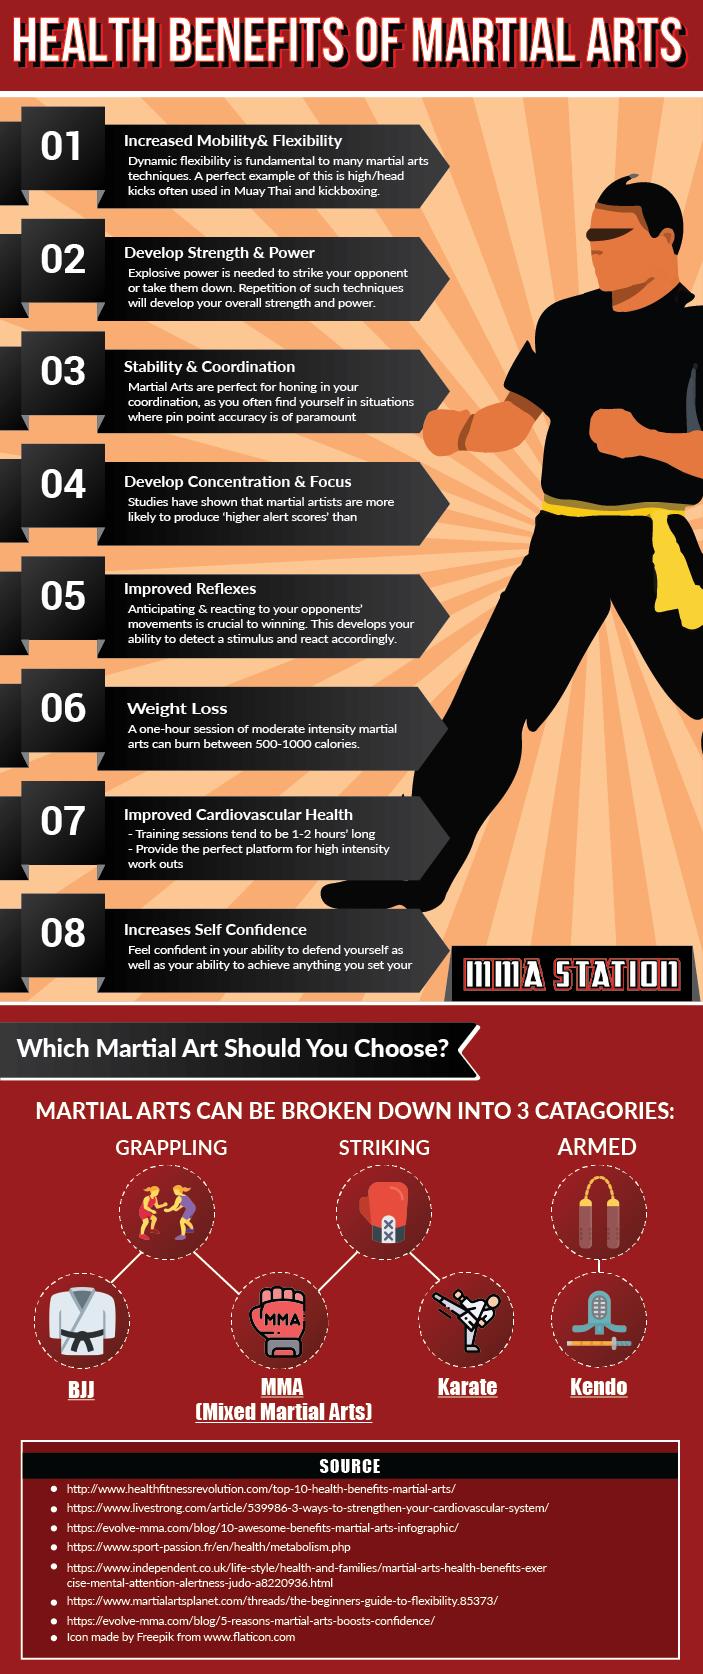 health benefits of MMA